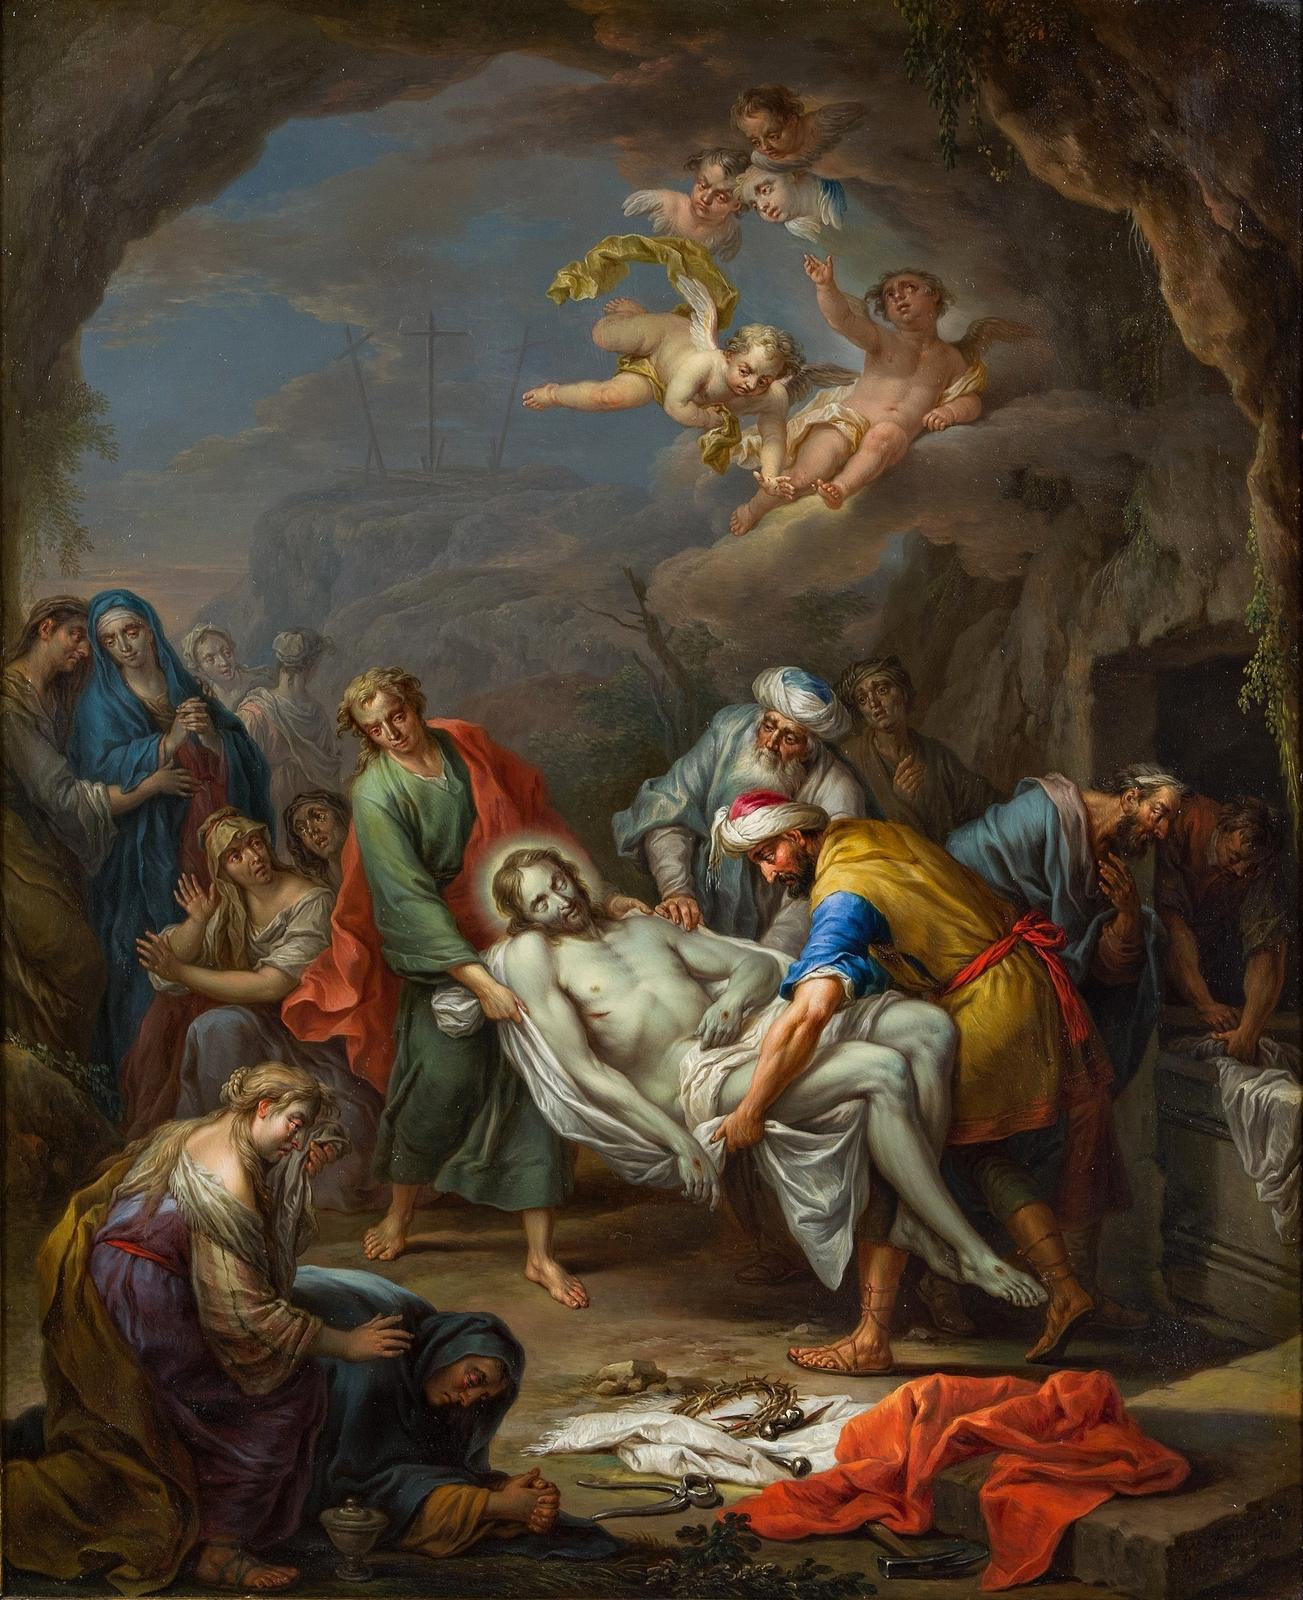 Franz christoph janneck baroque era style tutt 39 art for Famous artist in baroque period